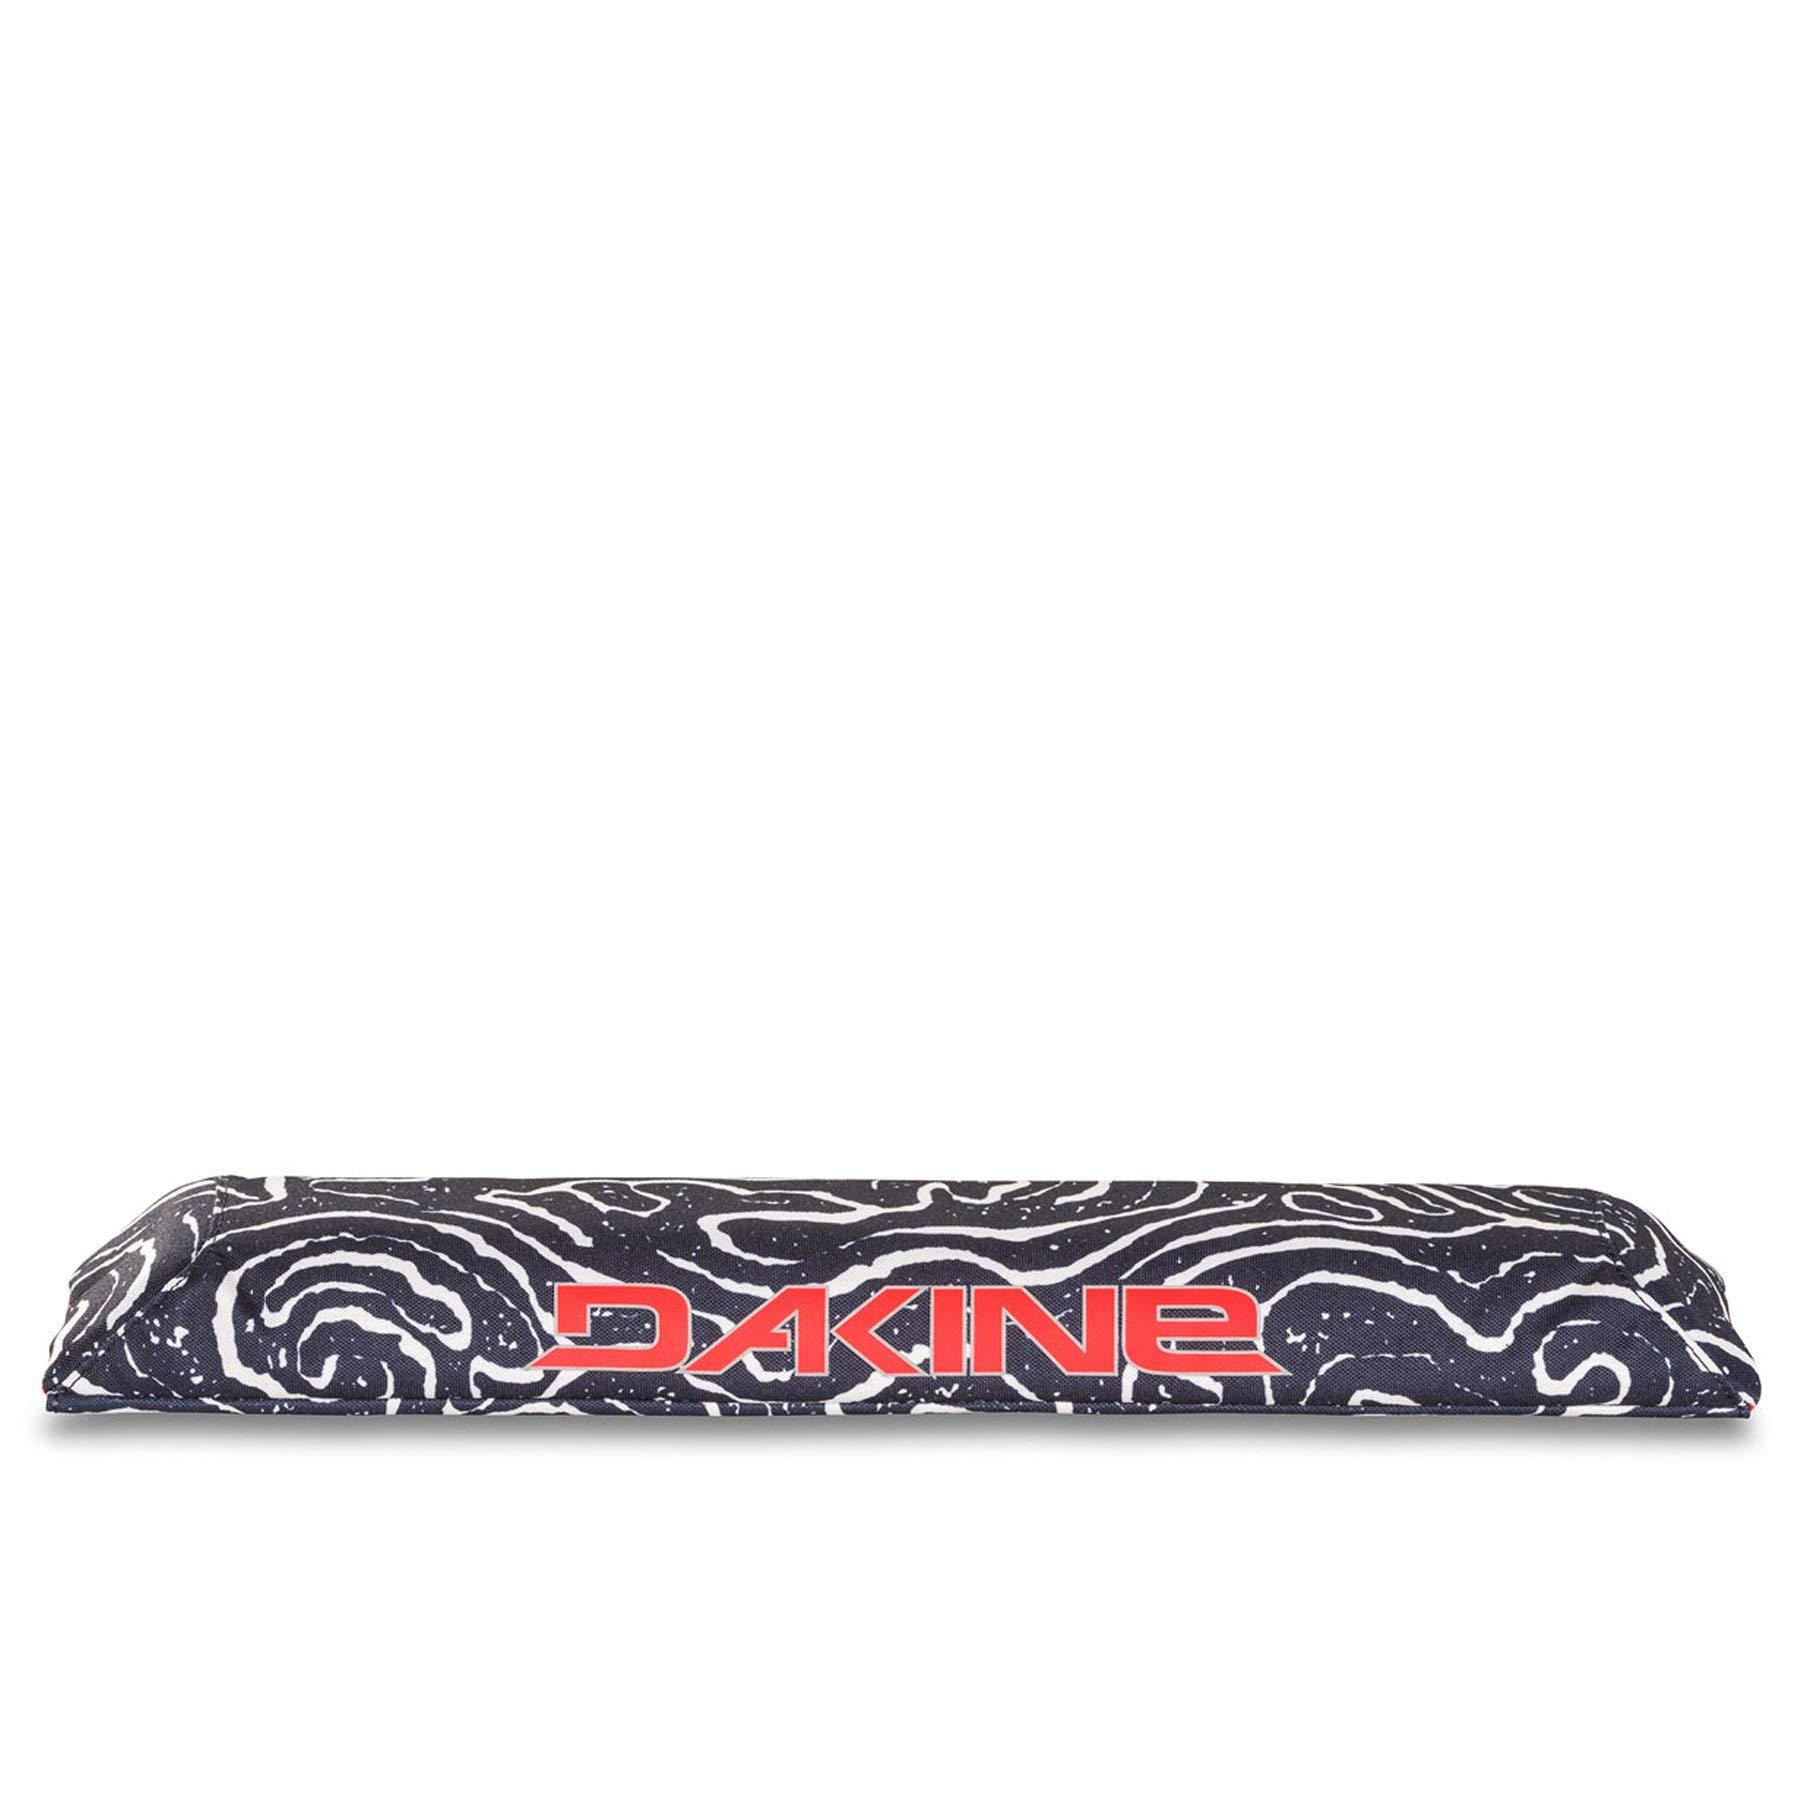 Dakine Extra Long Aero Rack Pads - Lava Tubes by Dakine